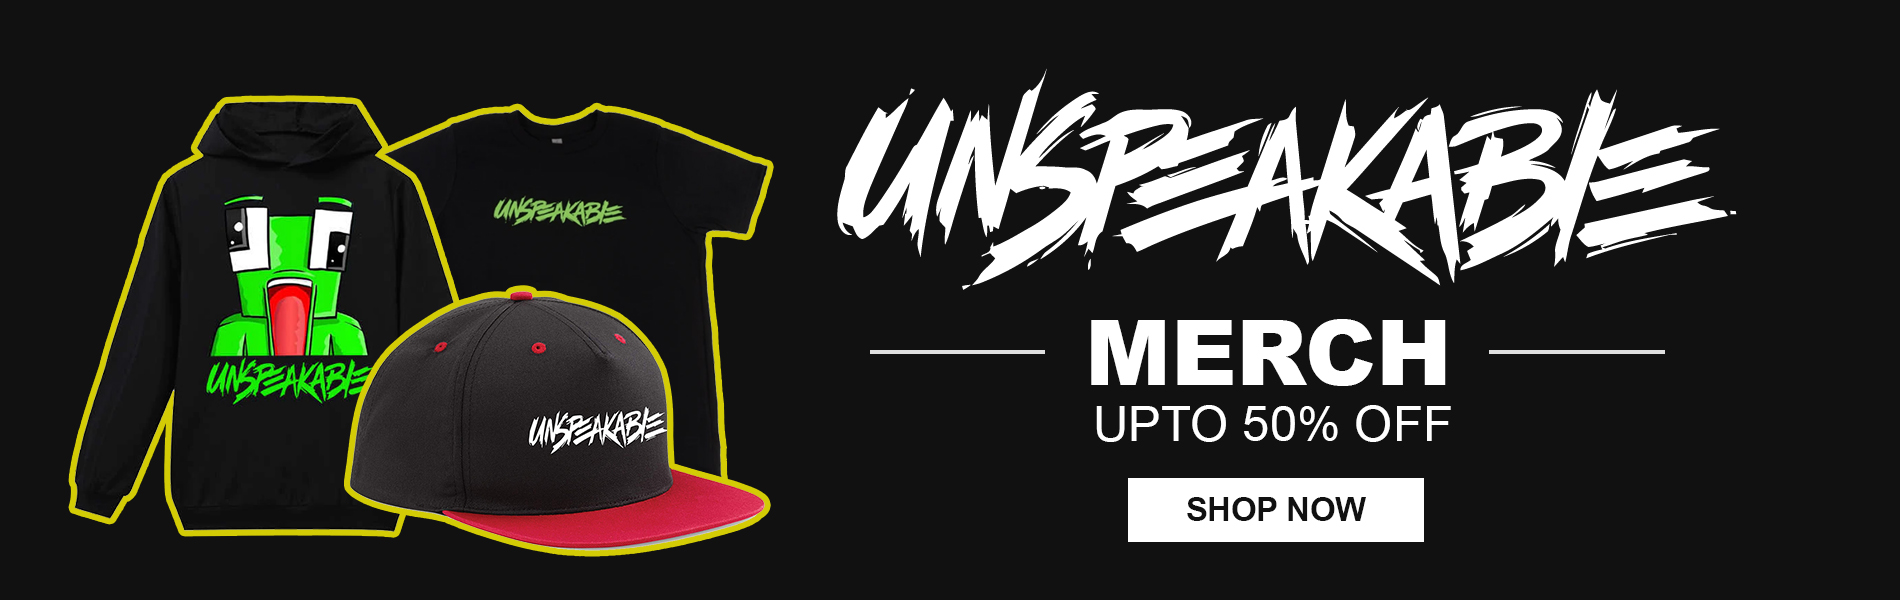 unspeakable merch.shop